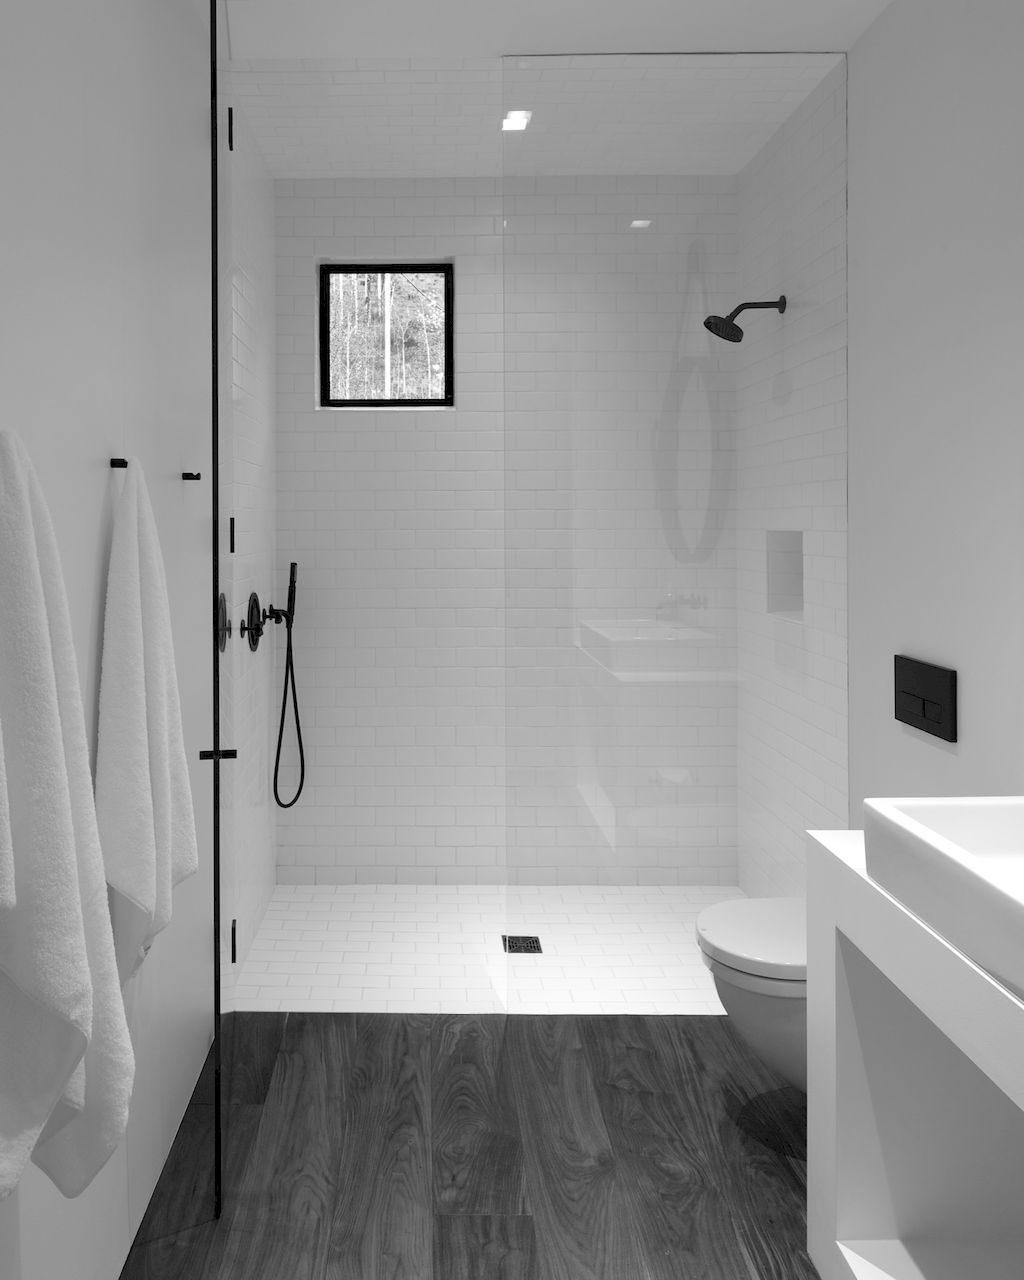 Inspiring 25 Awesome Scandinavian Bathroom Design Ideas Https Decoor Net 25 Awesome Bathroom Design Small Modern Modern Small Bathrooms Minimalist Bathroom